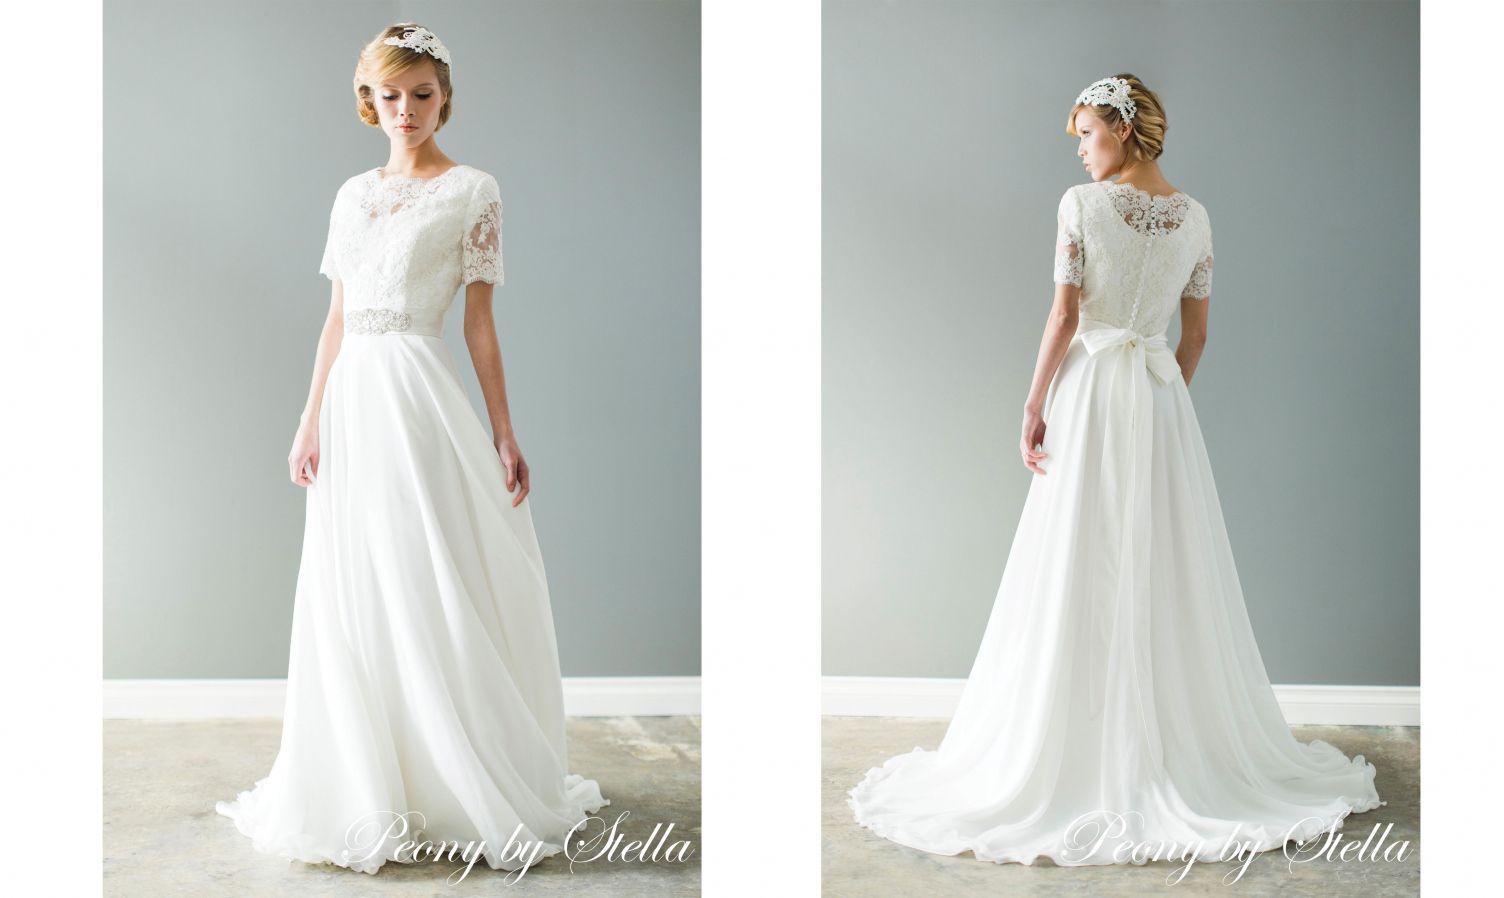 Luxury Wedding Dress Rental Utah Check more at http://svesty.com ...